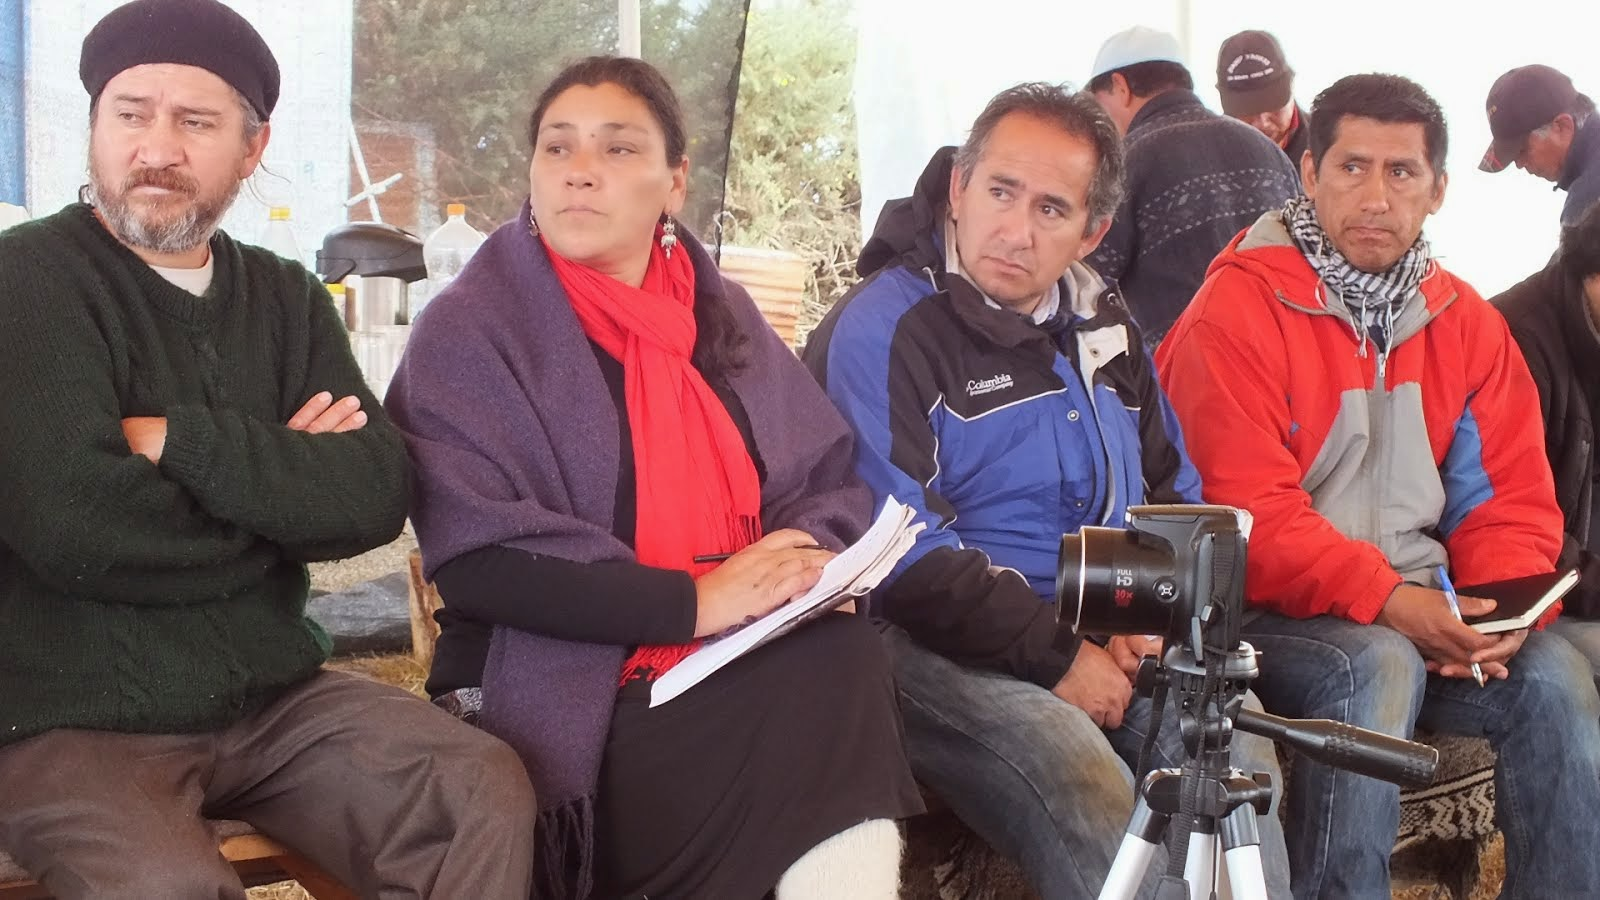 Imag Izq a Derecha, Julio e Ivon de Radio Werken Kuruf, Carlos de Radio Kimche Mapu y Elias Paillan